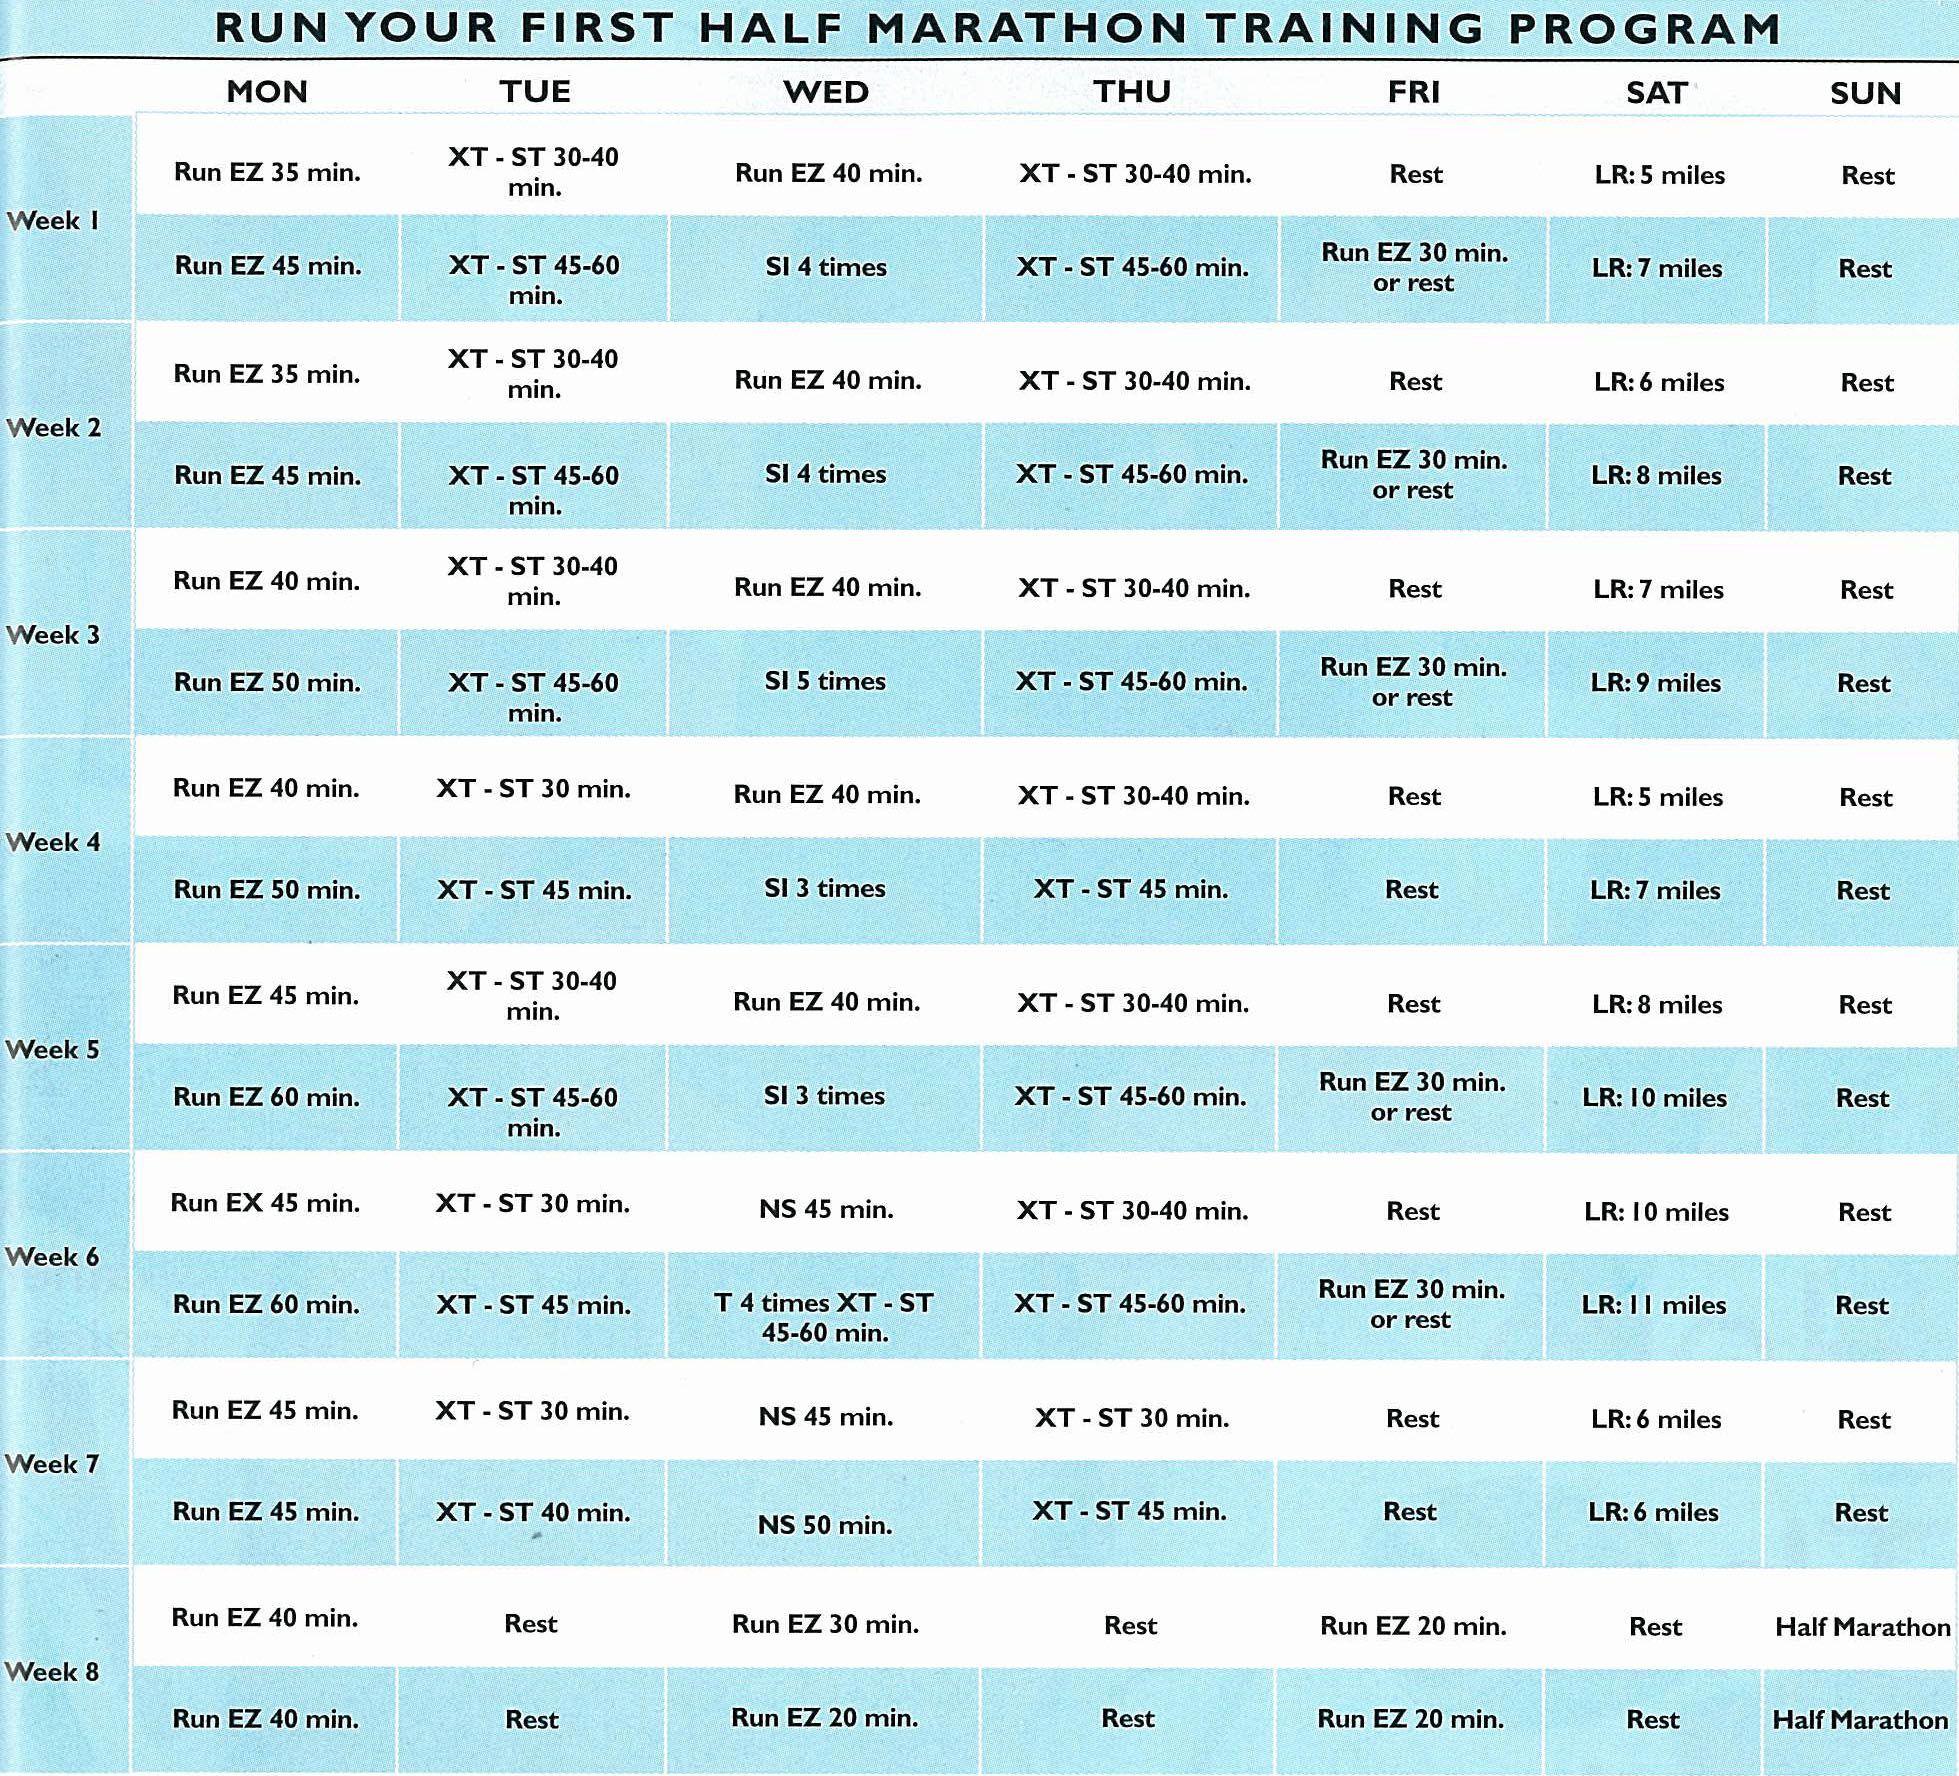 HalfMarathonTrainingScheduleJpg   Exercise